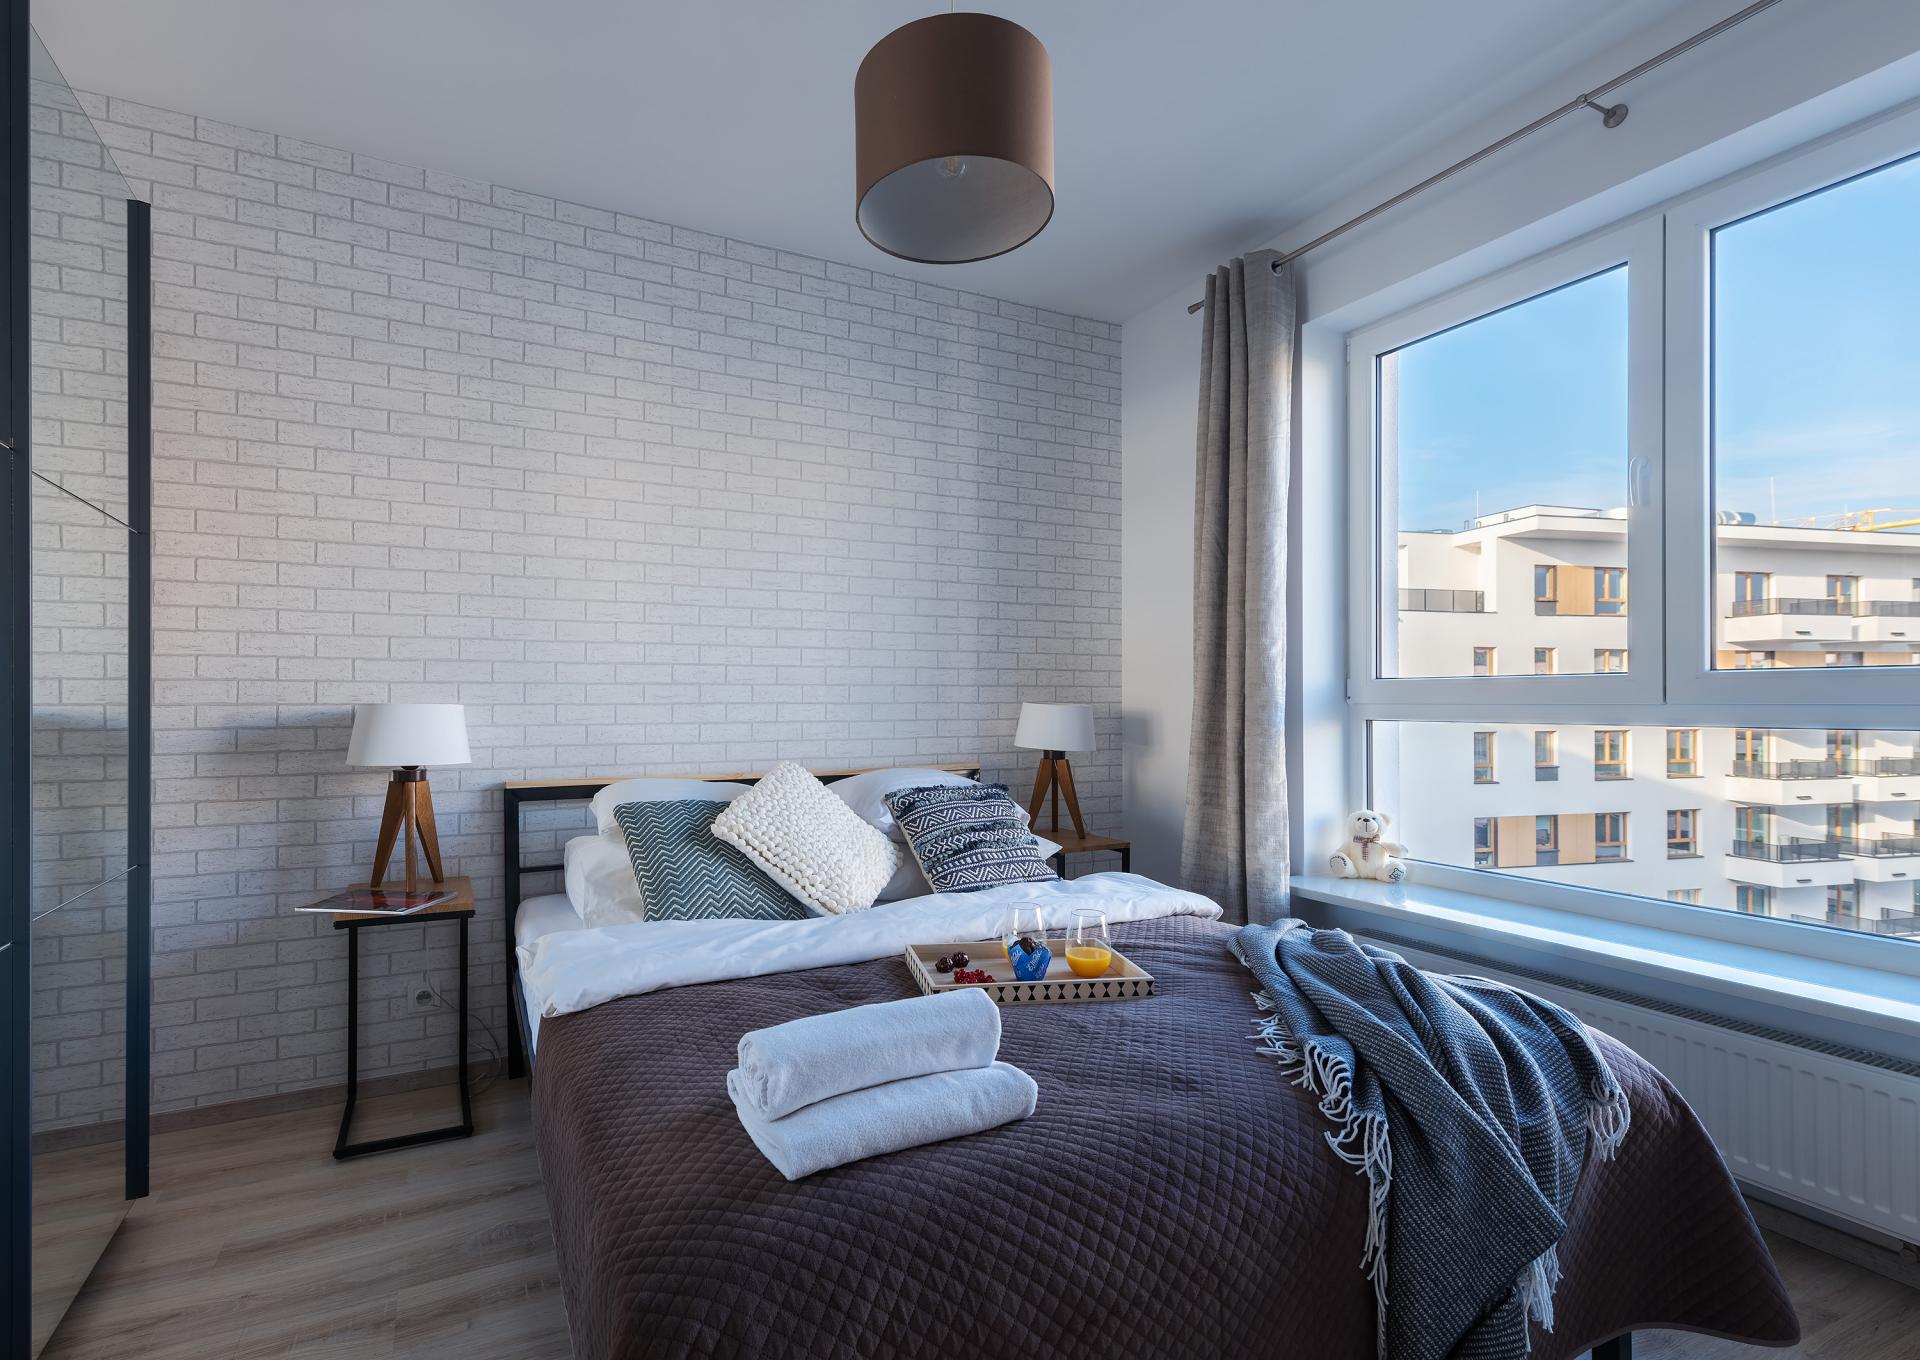 Bright bedroom at Cybernetyki Apartments, Sluzewiec, Warsaw